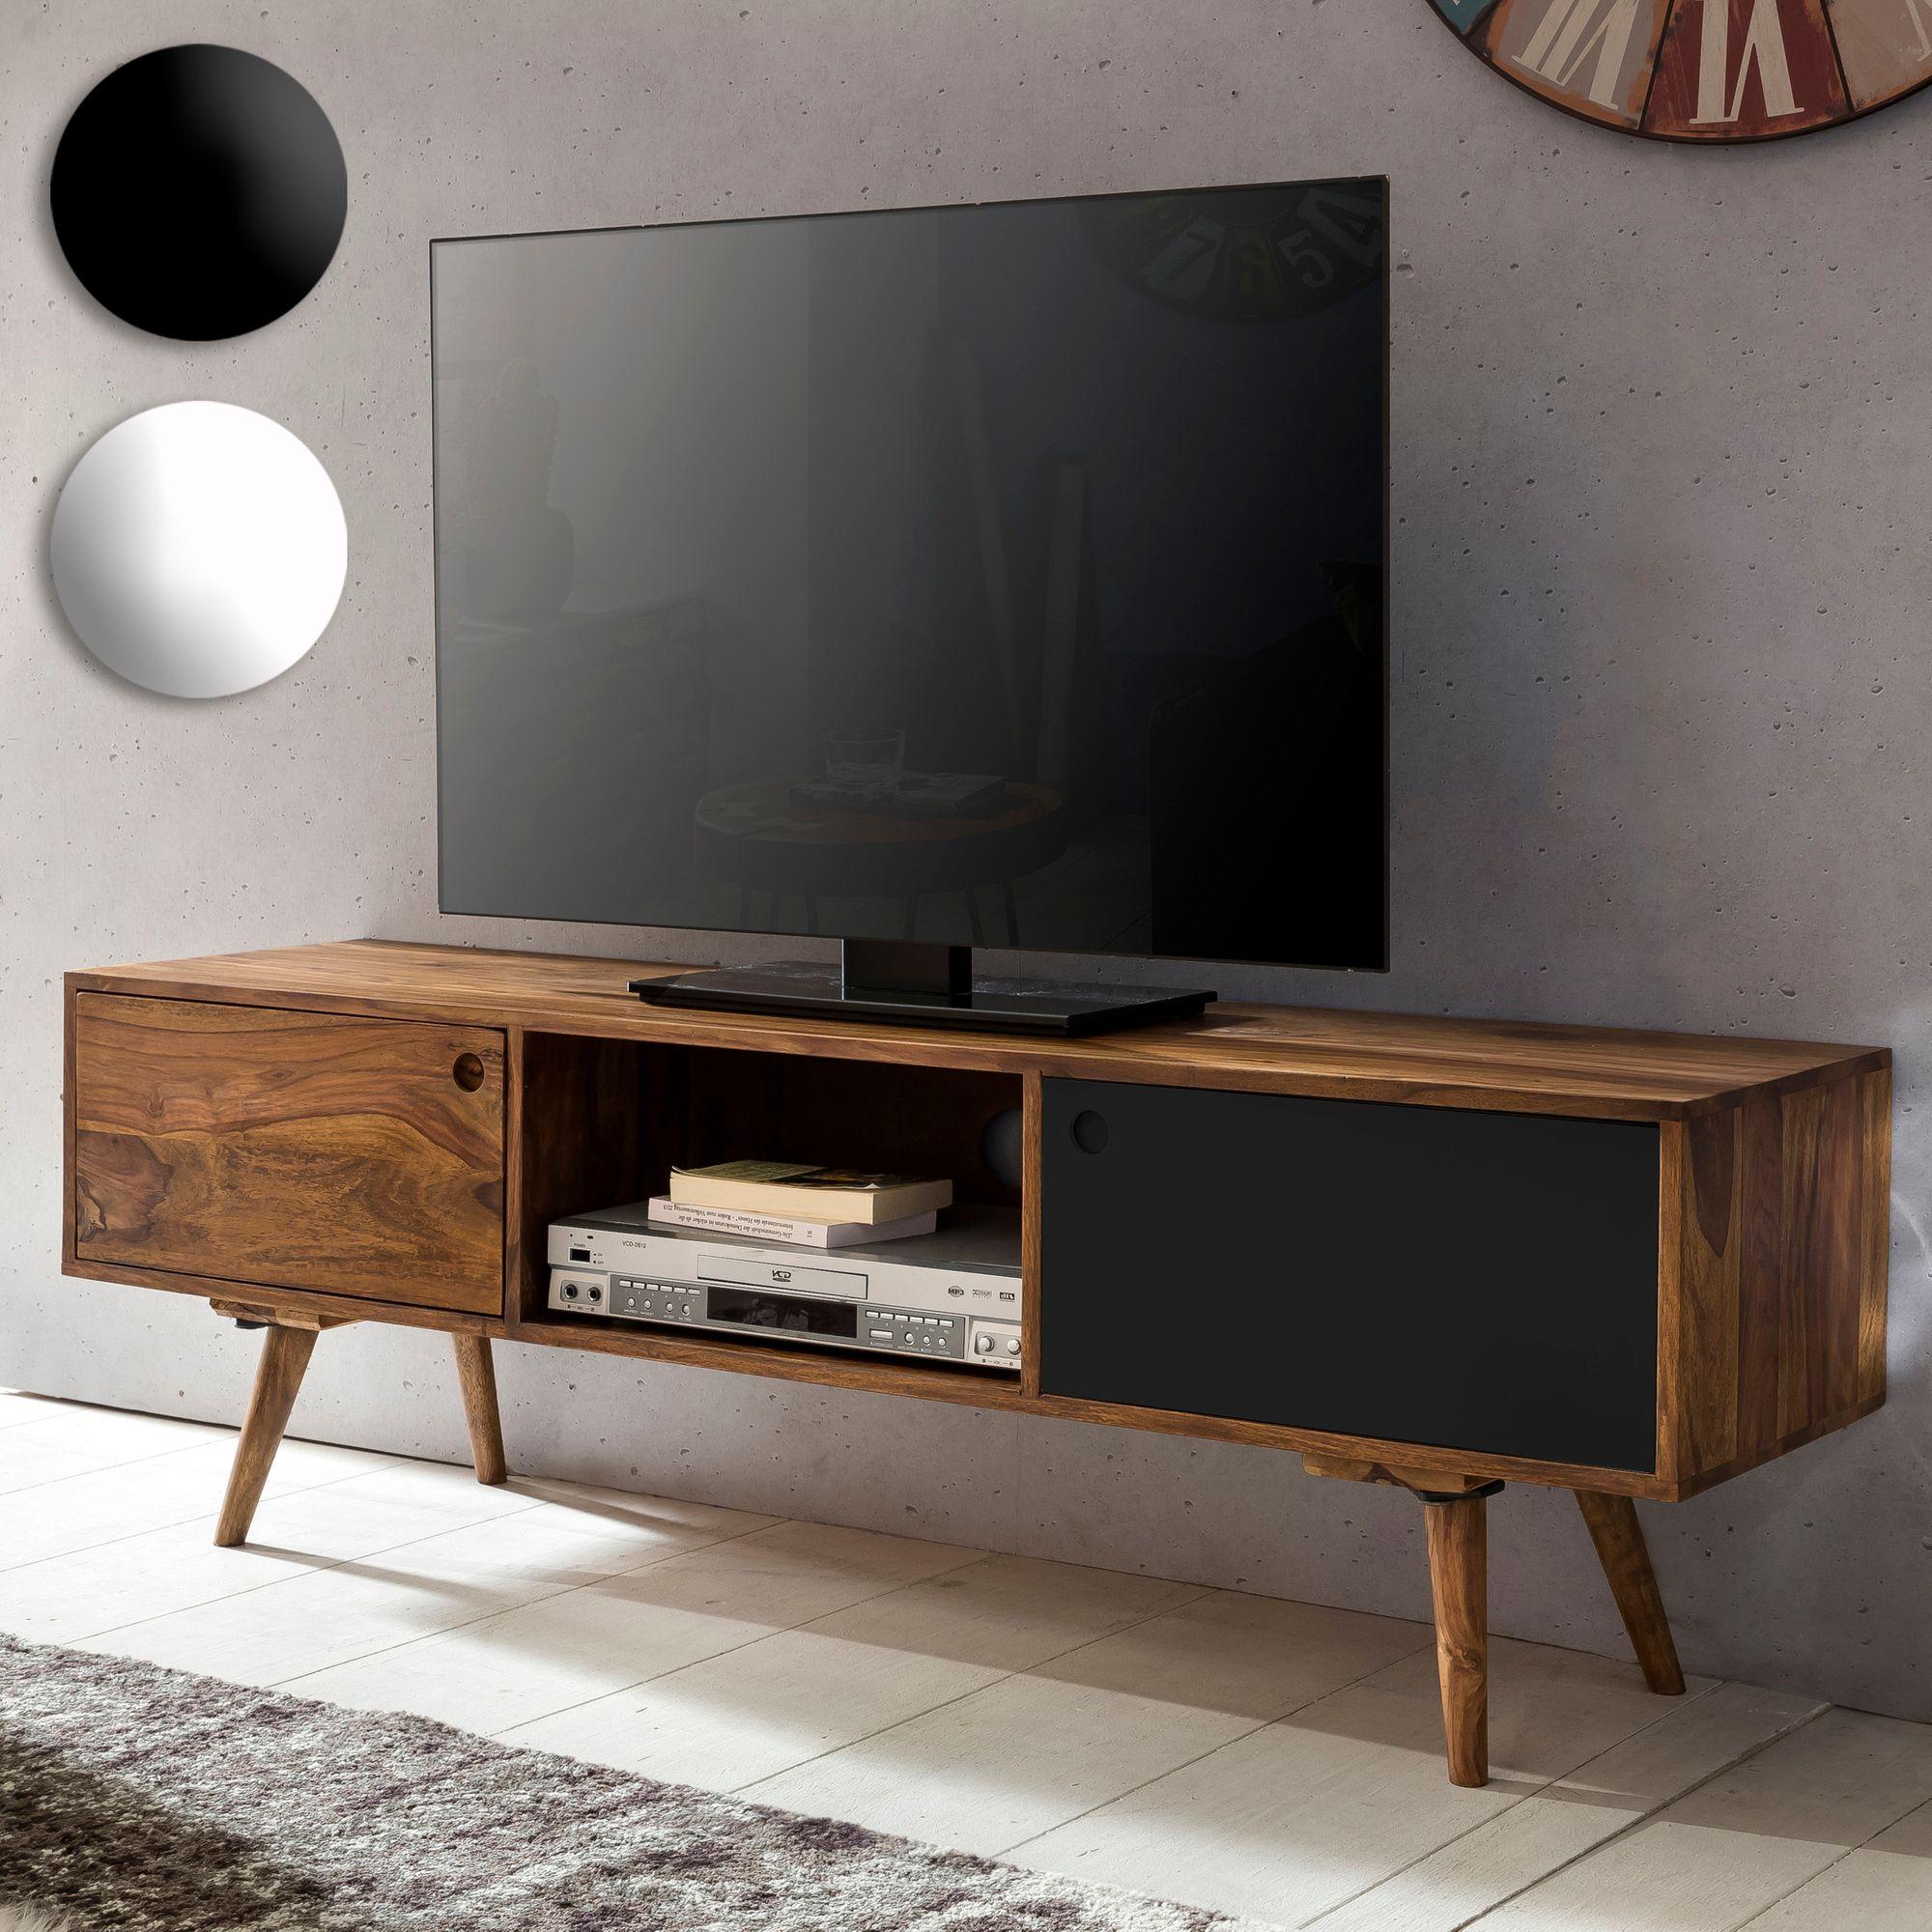 Tv Lowboard 140 Cm Massiv Holz Sheesham Landhaus 2 Turen Fach